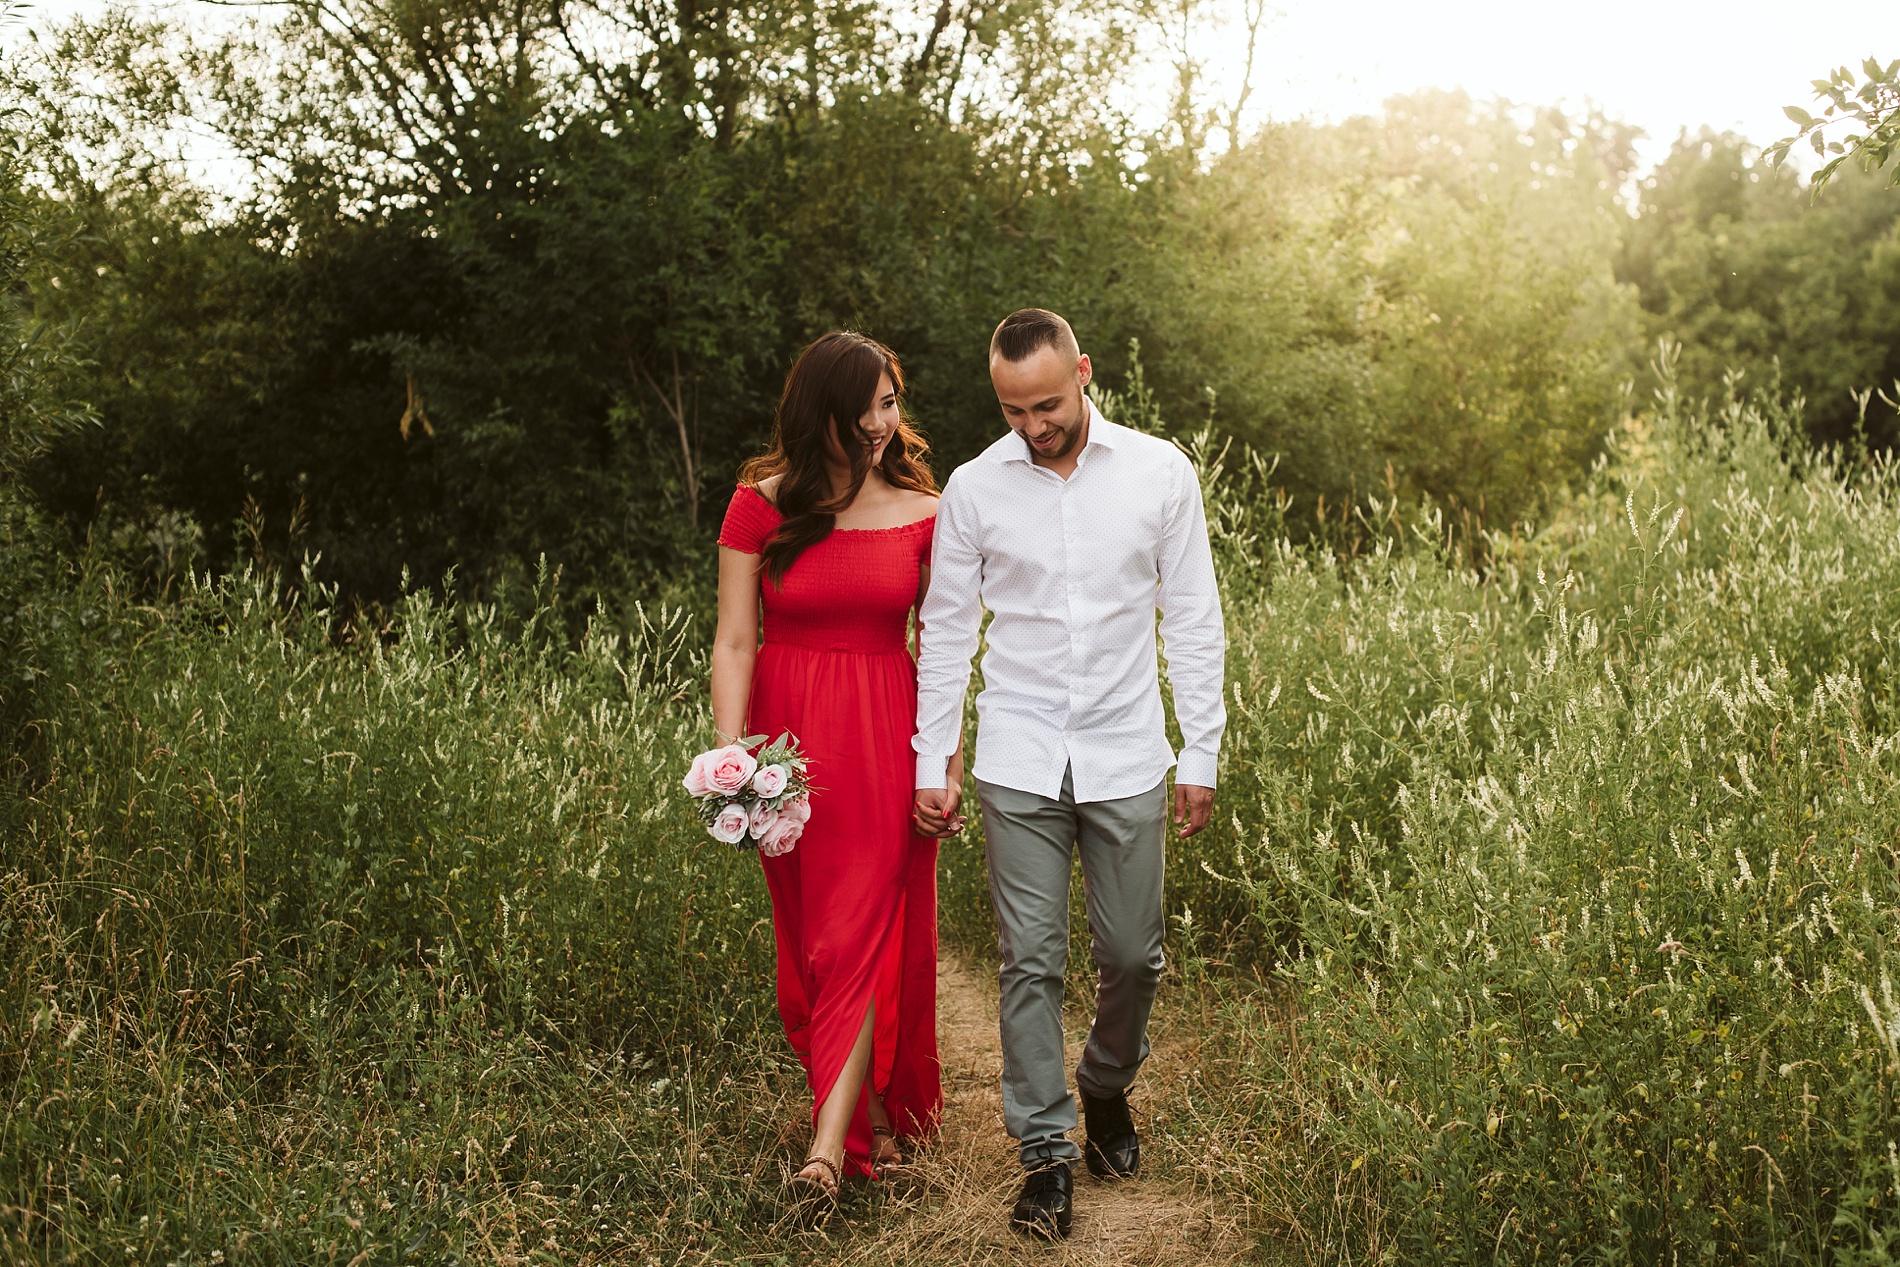 Scarborough_Bluffs_engagement_shoot_Best_Toronto_Wedding_Photographers_0001.jpg